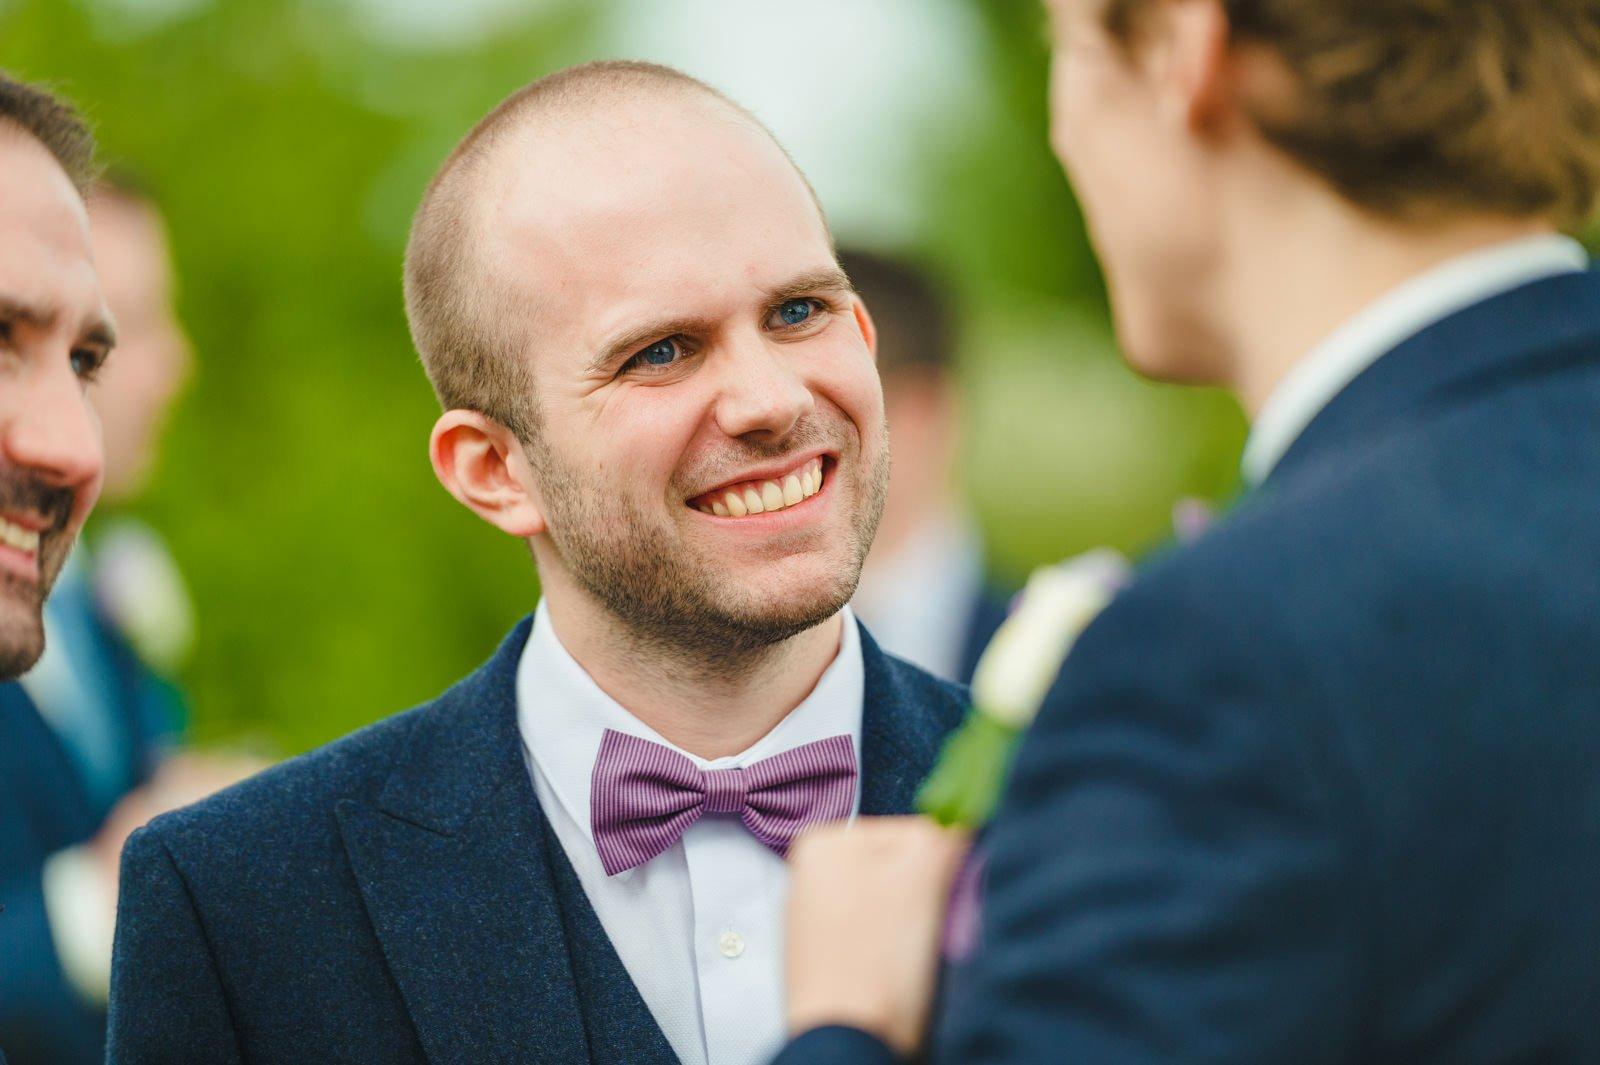 Millers Of Netley wedding, Dorrington, Shrewsbury | Emma + Ben 62